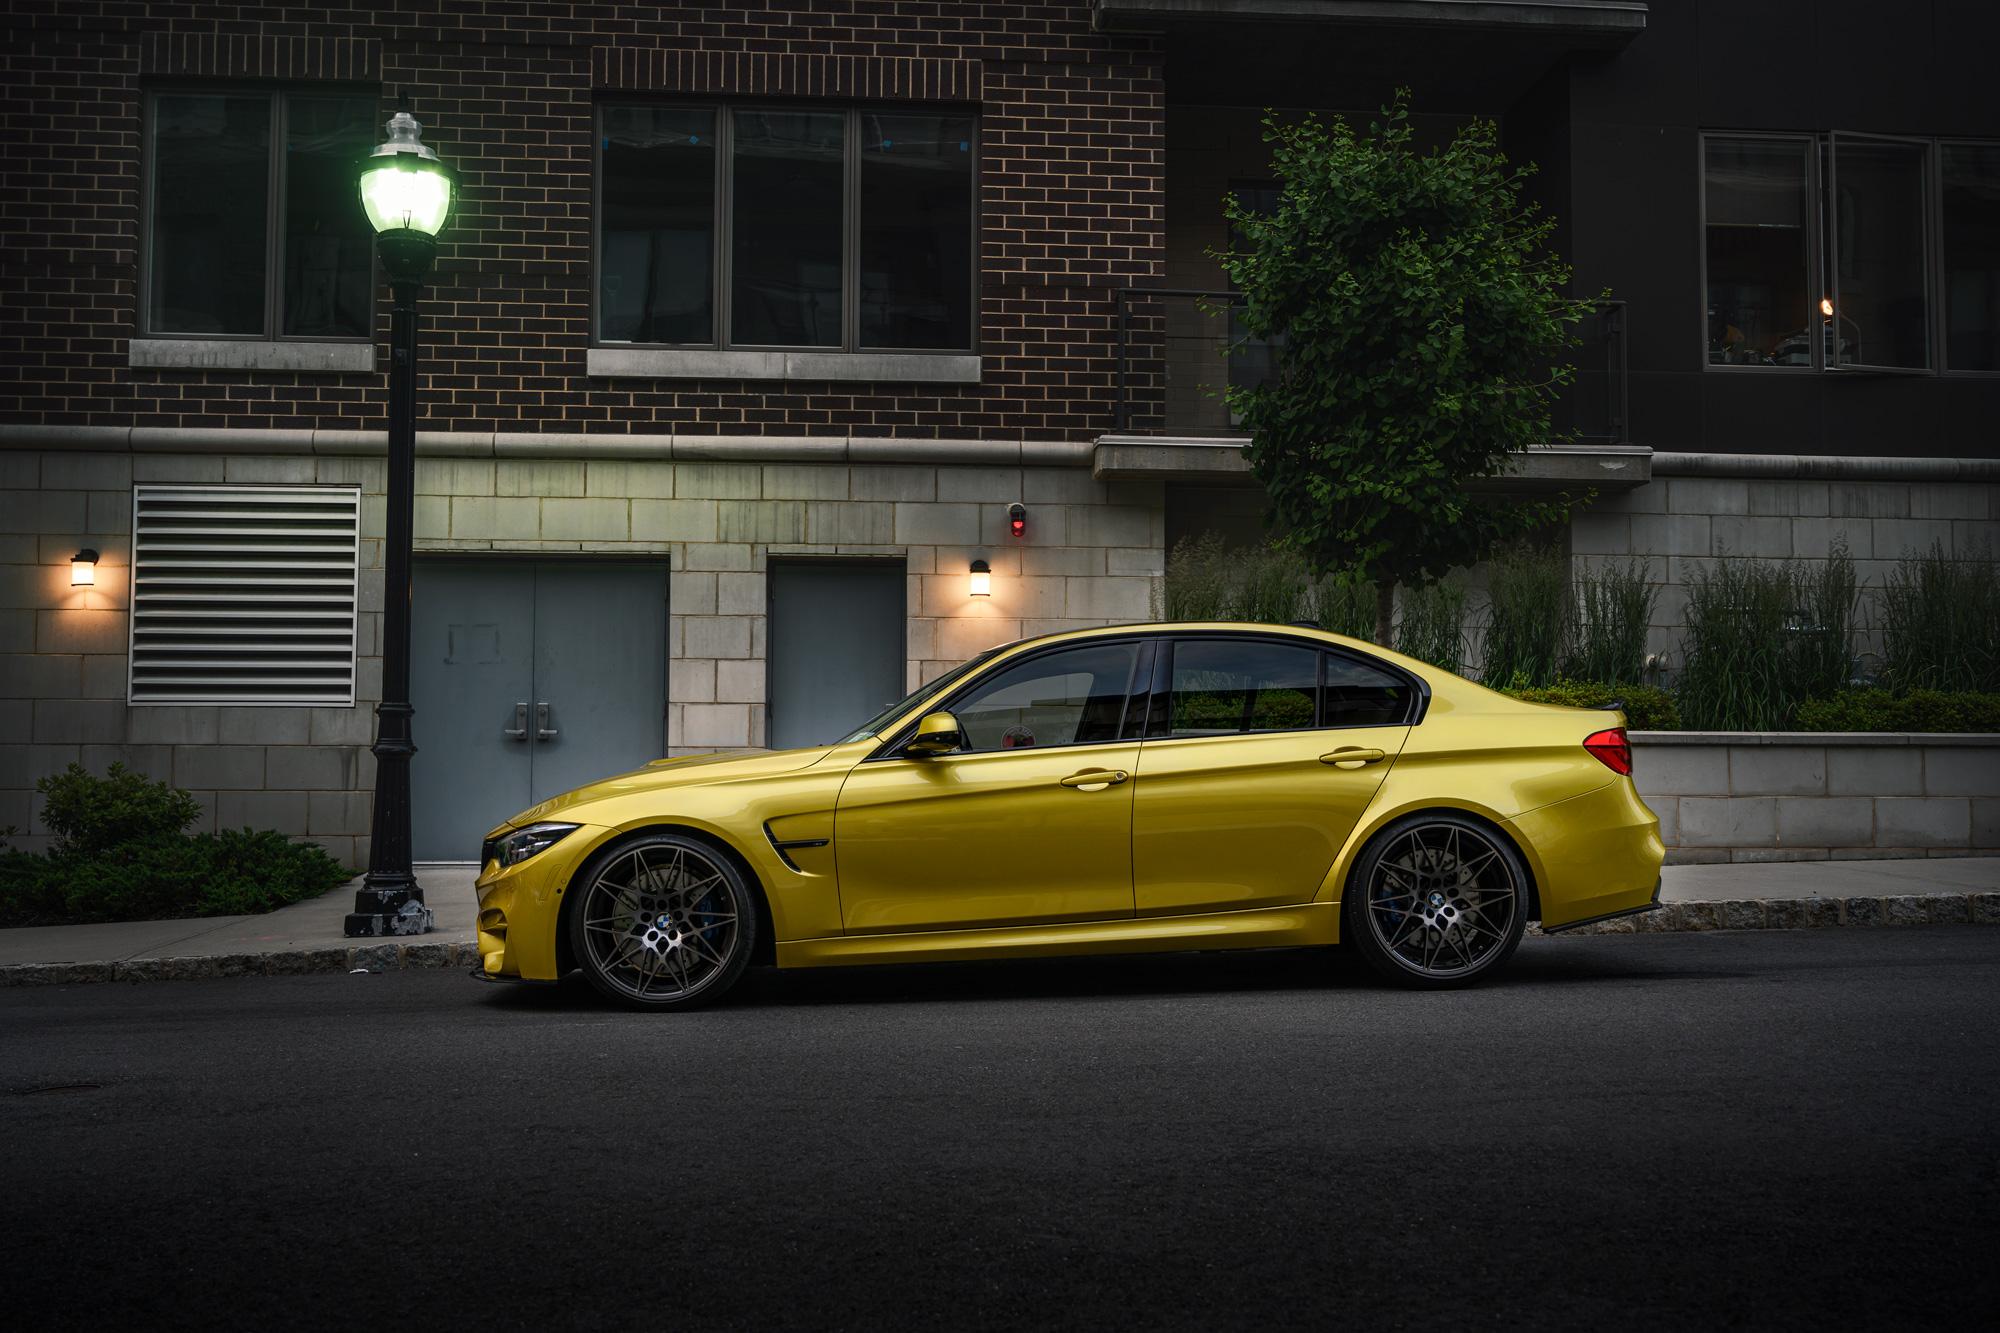 BMW M3 Austin Yellow